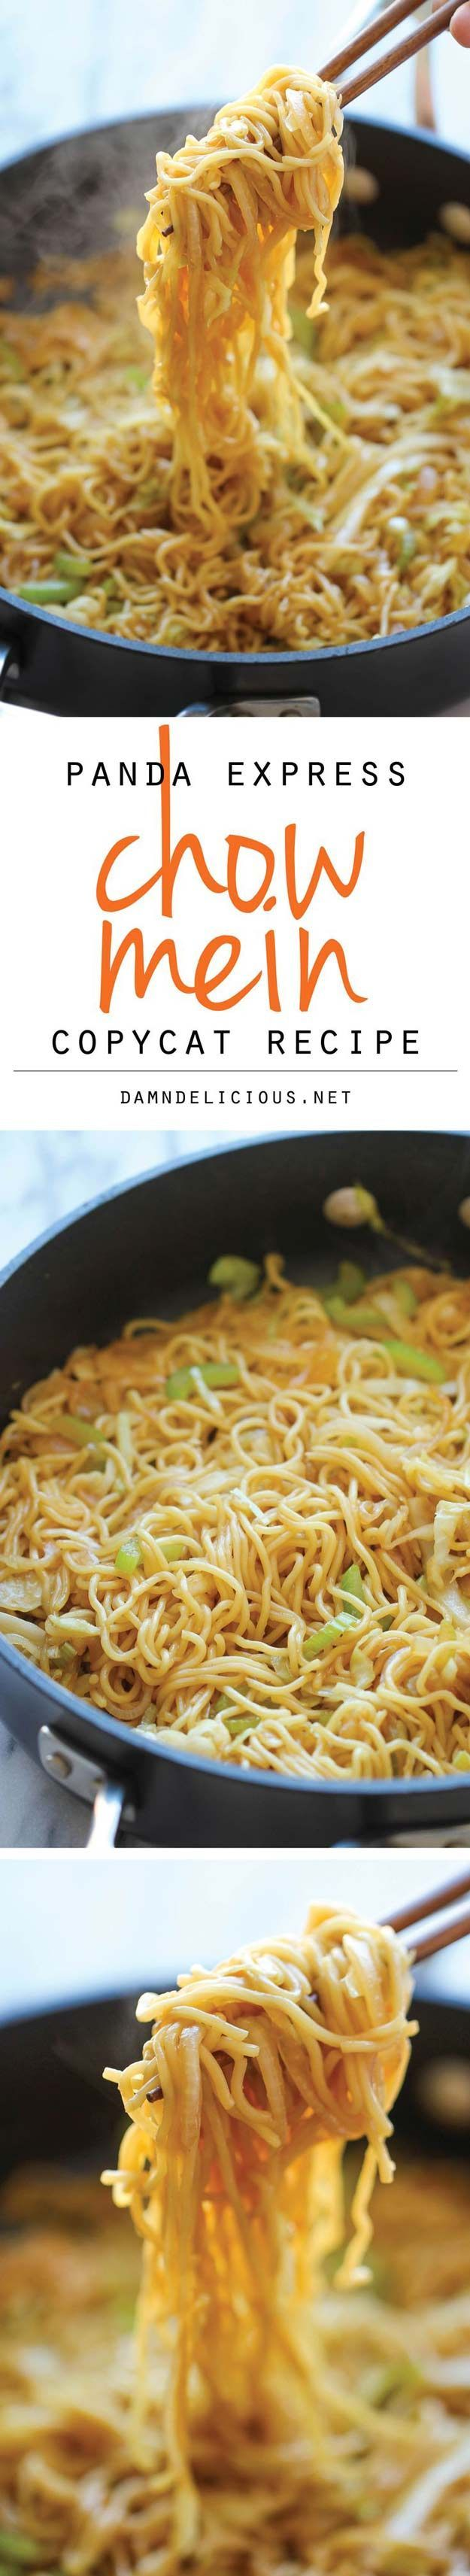 Best 25 Top restaurants ideas on Pinterest